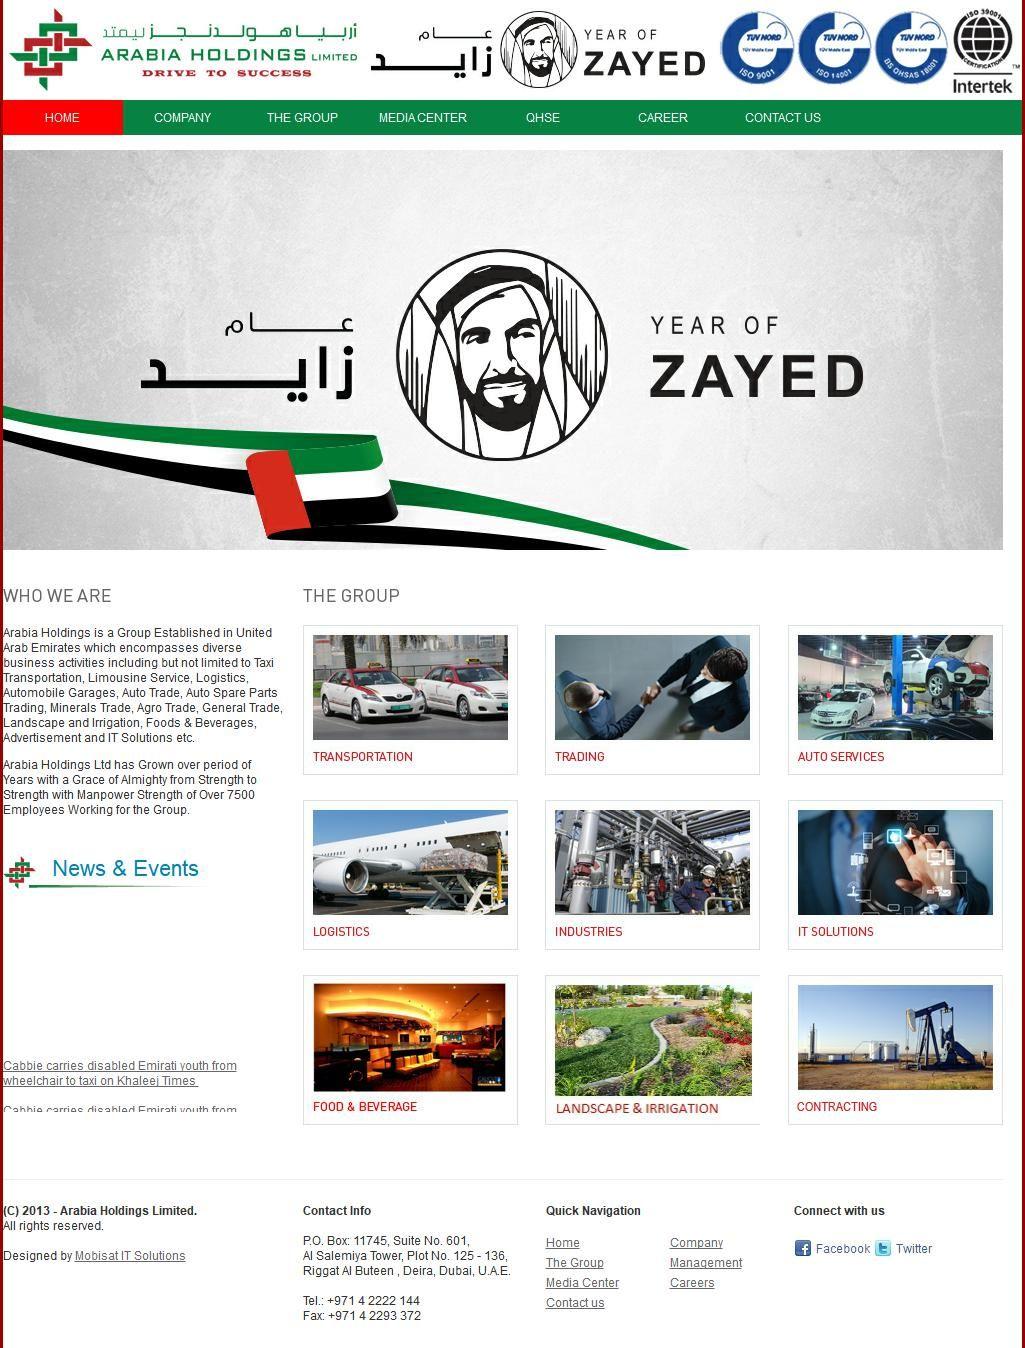 Arabia Holdings, Ltd Al Salemiyah Towers, 12, 6b Street 5